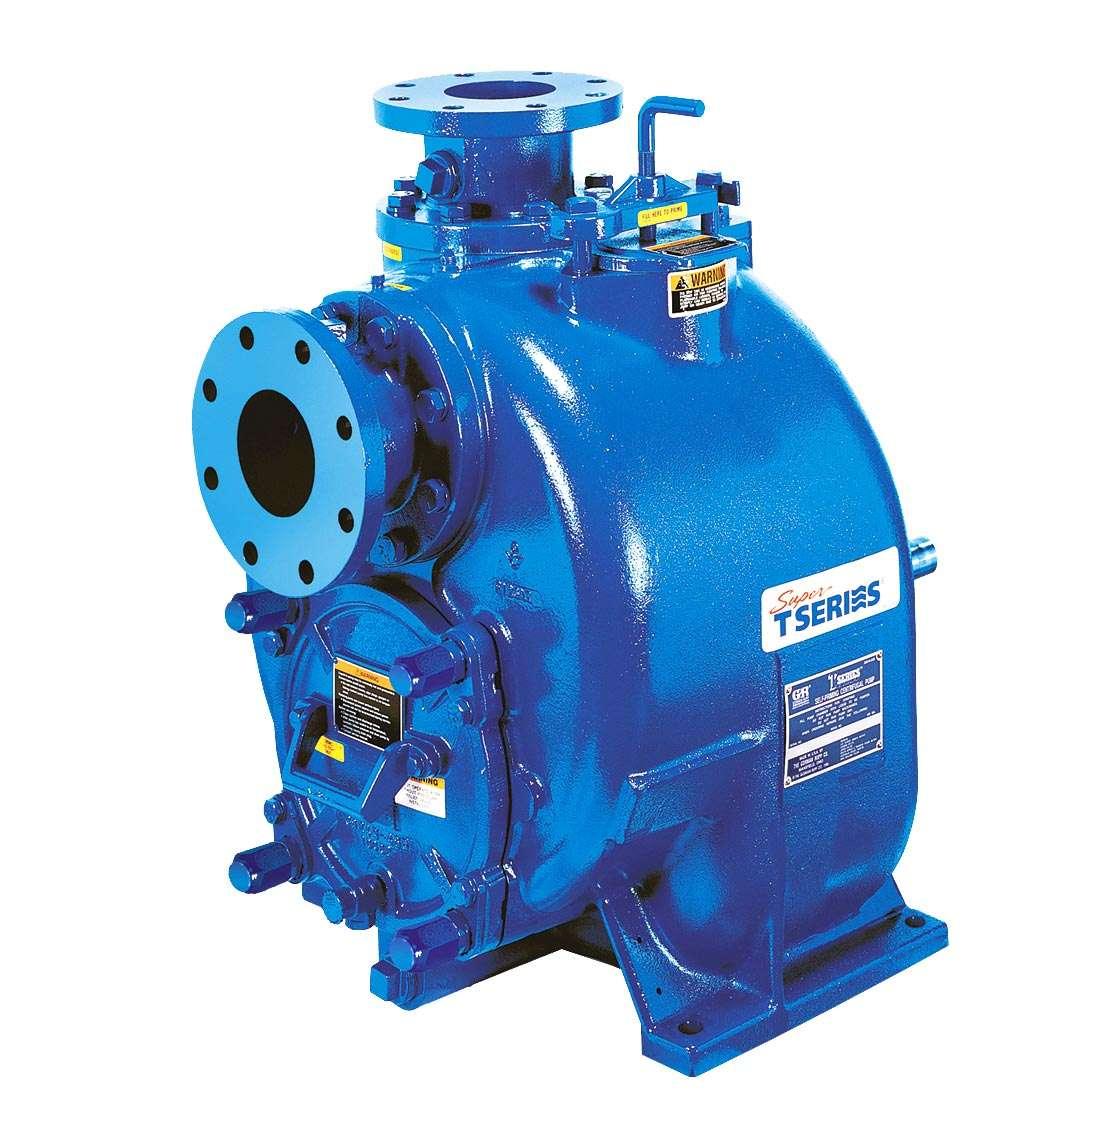 Super T Series Gorman-Rupp self-priming pump